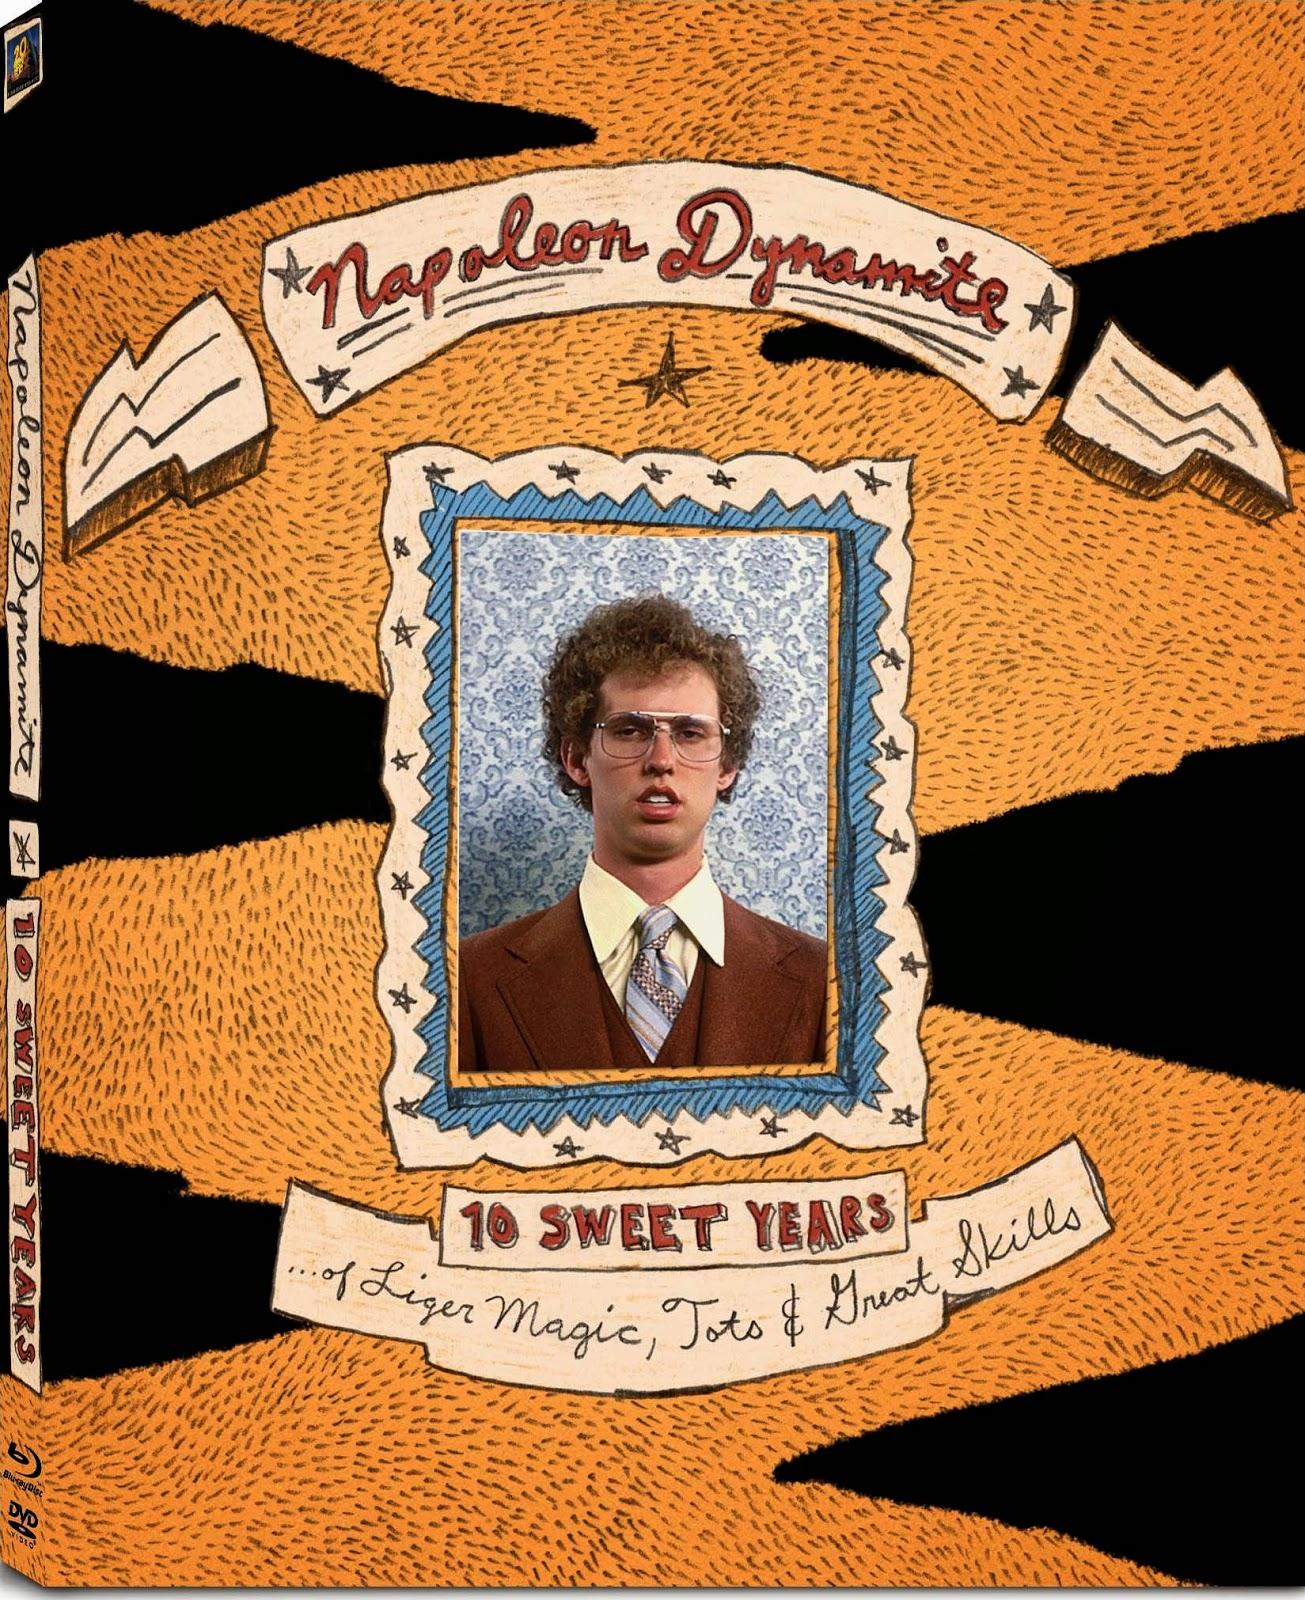 Napoleon Dynamite 10th anniversary Blu-ray